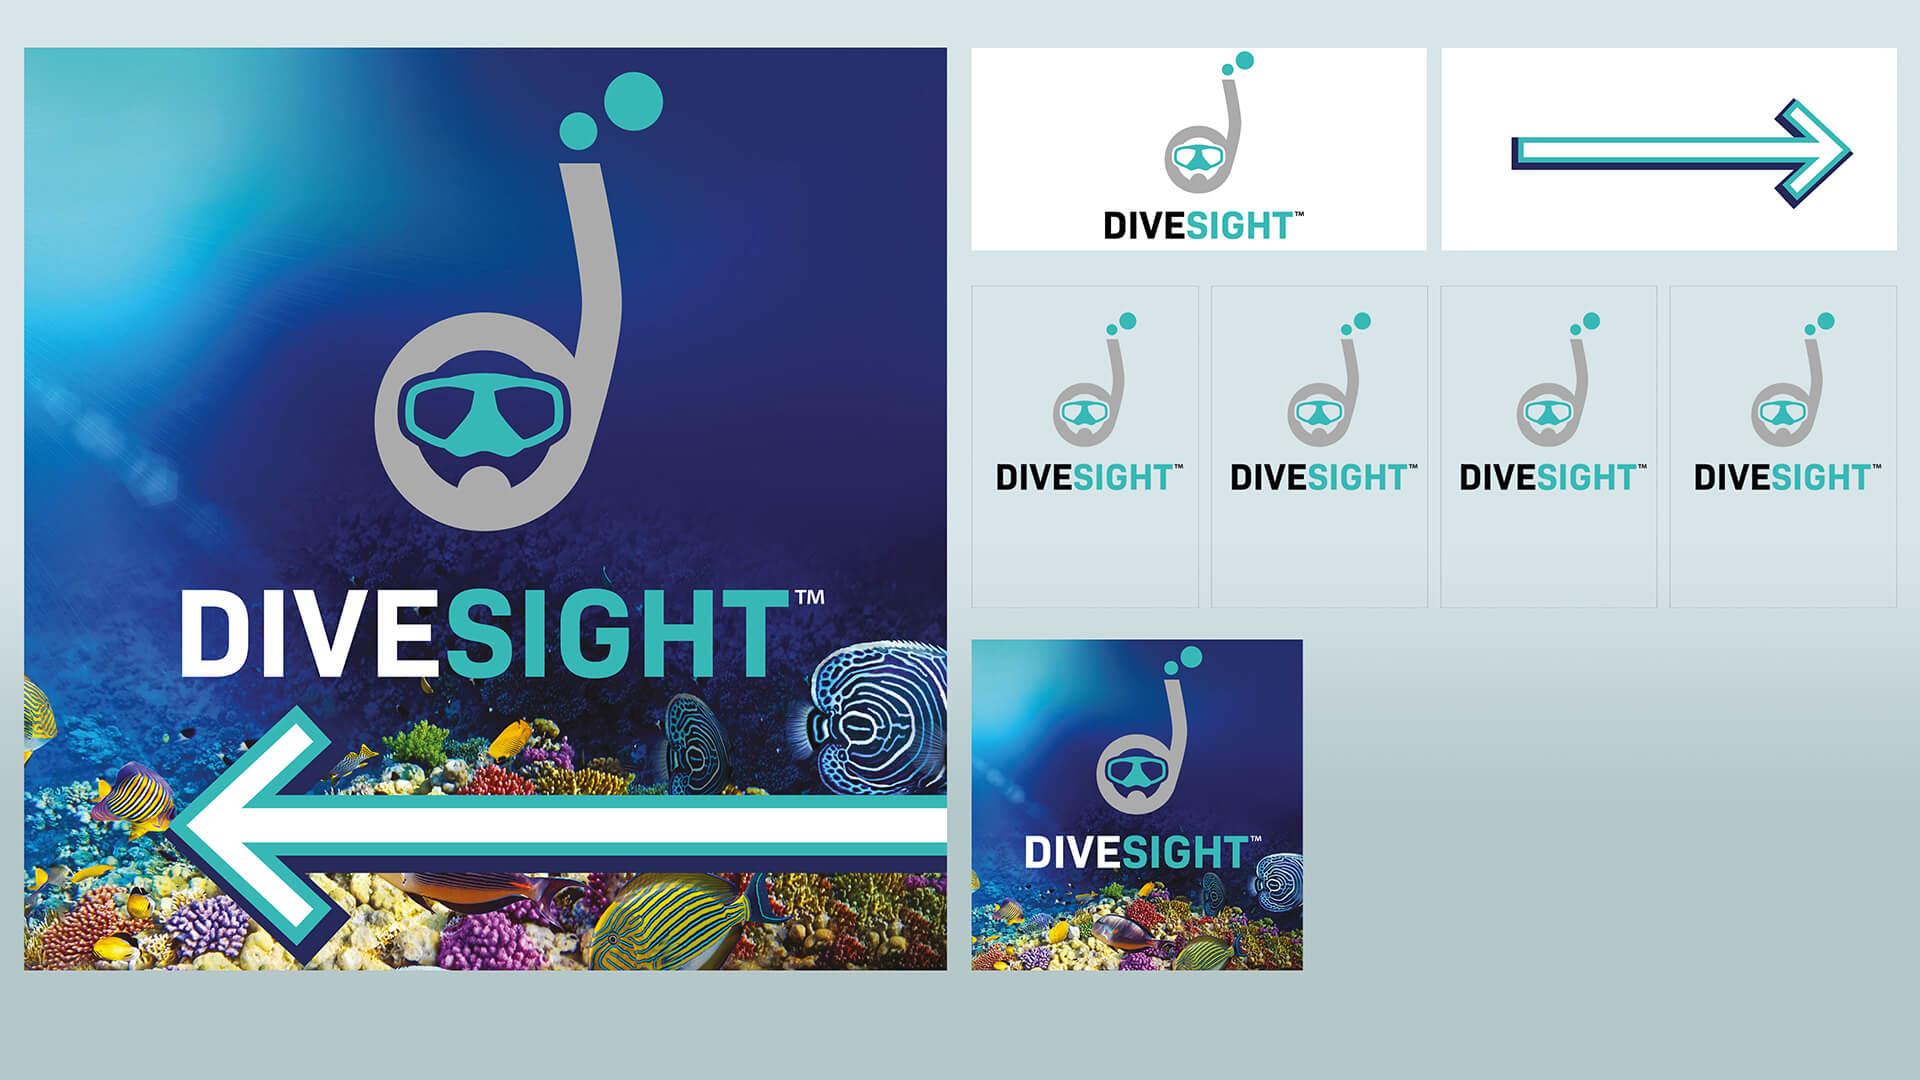 divesight 8